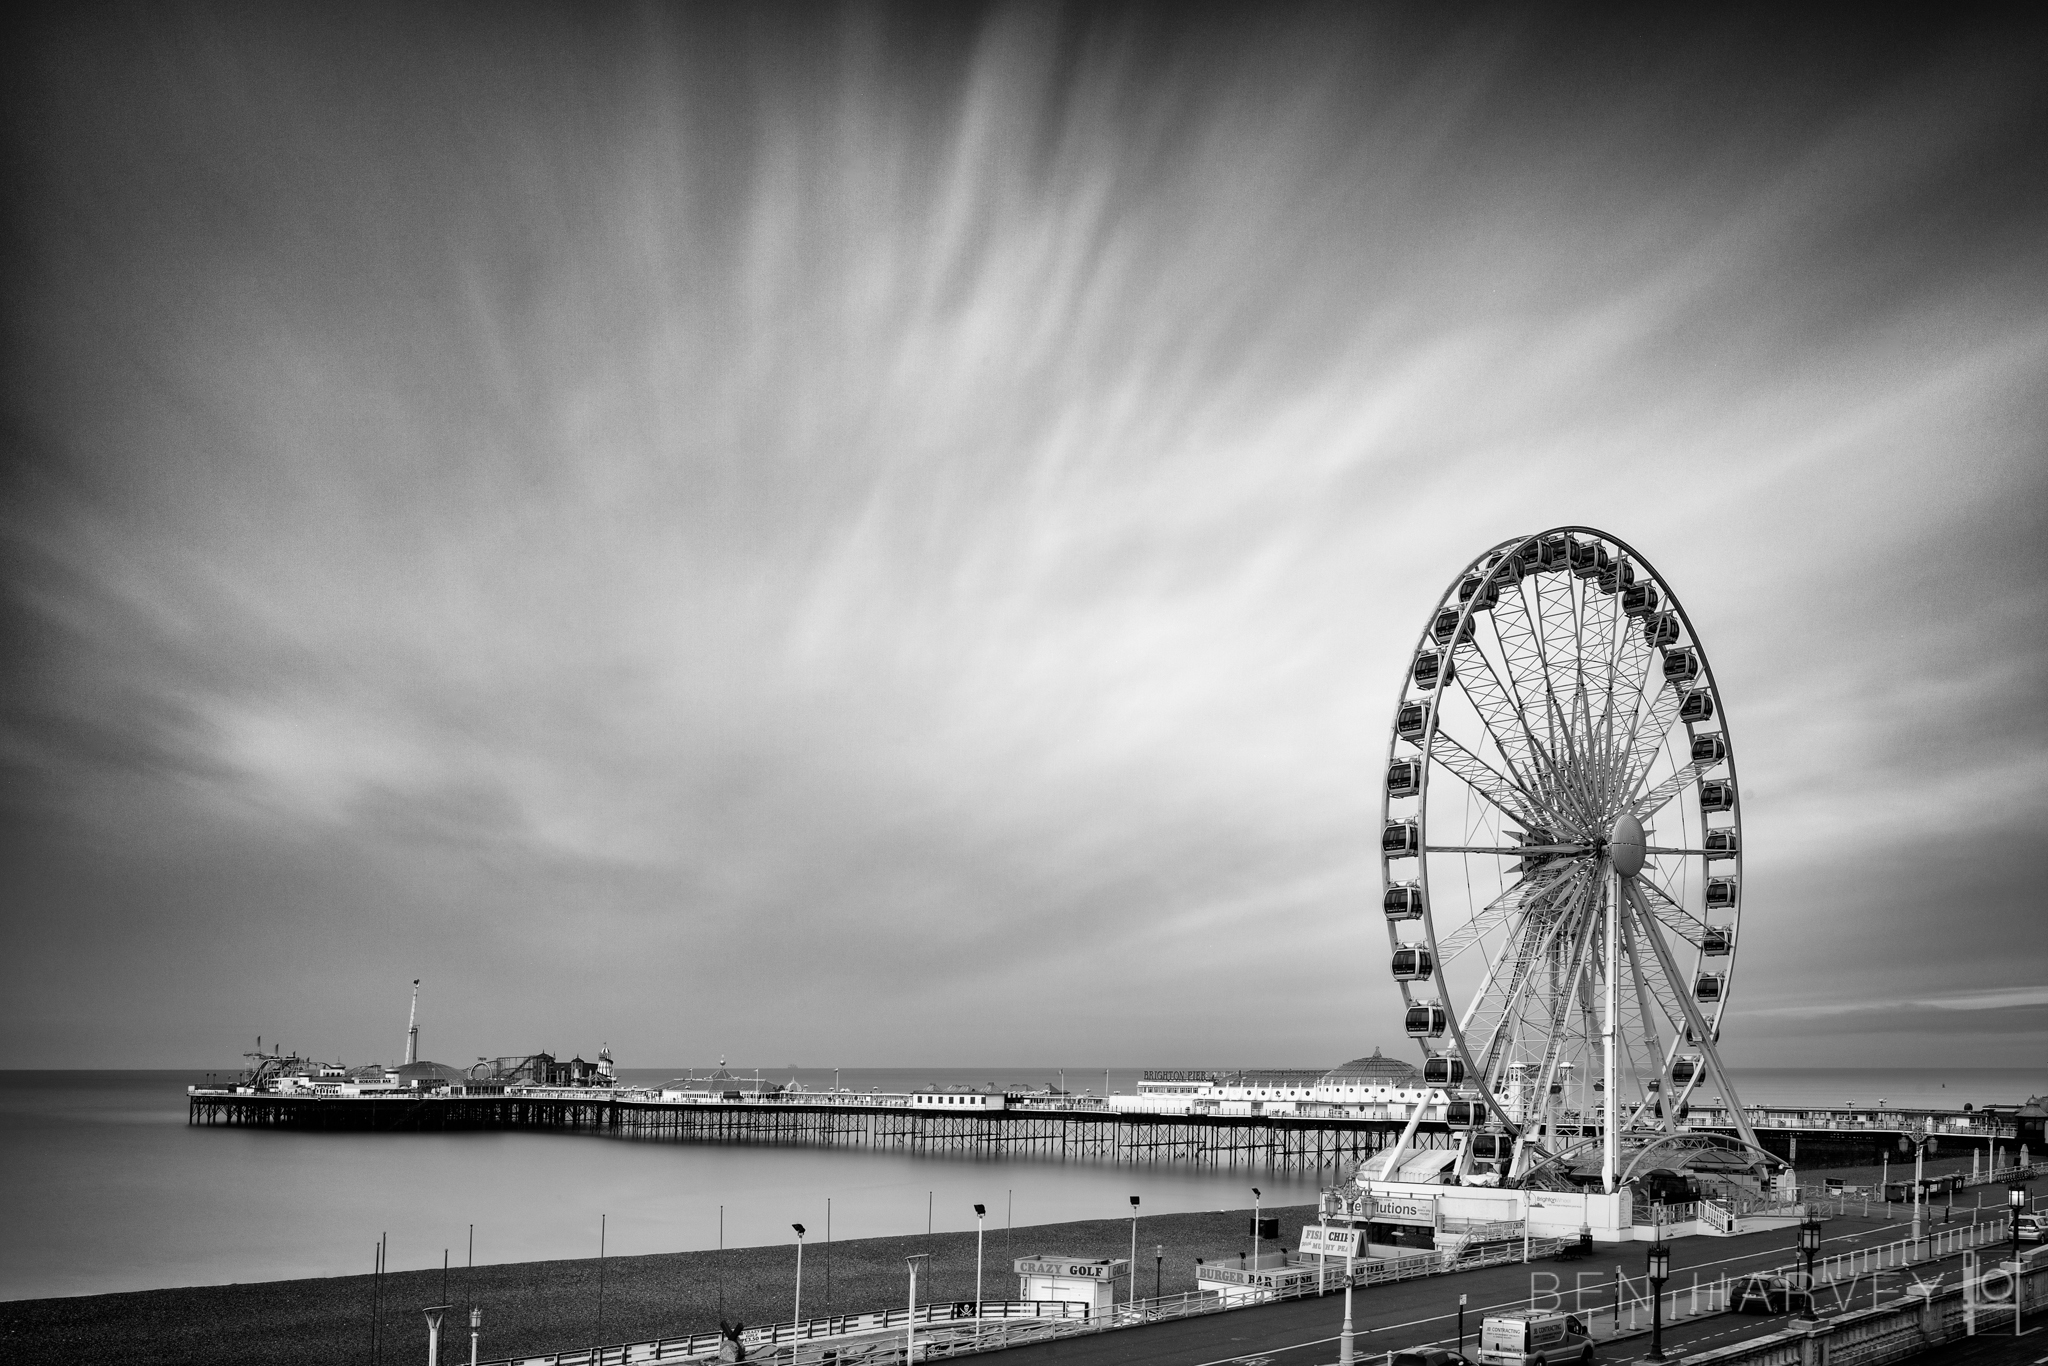 Palace Pier and Wheel @ Sunrise